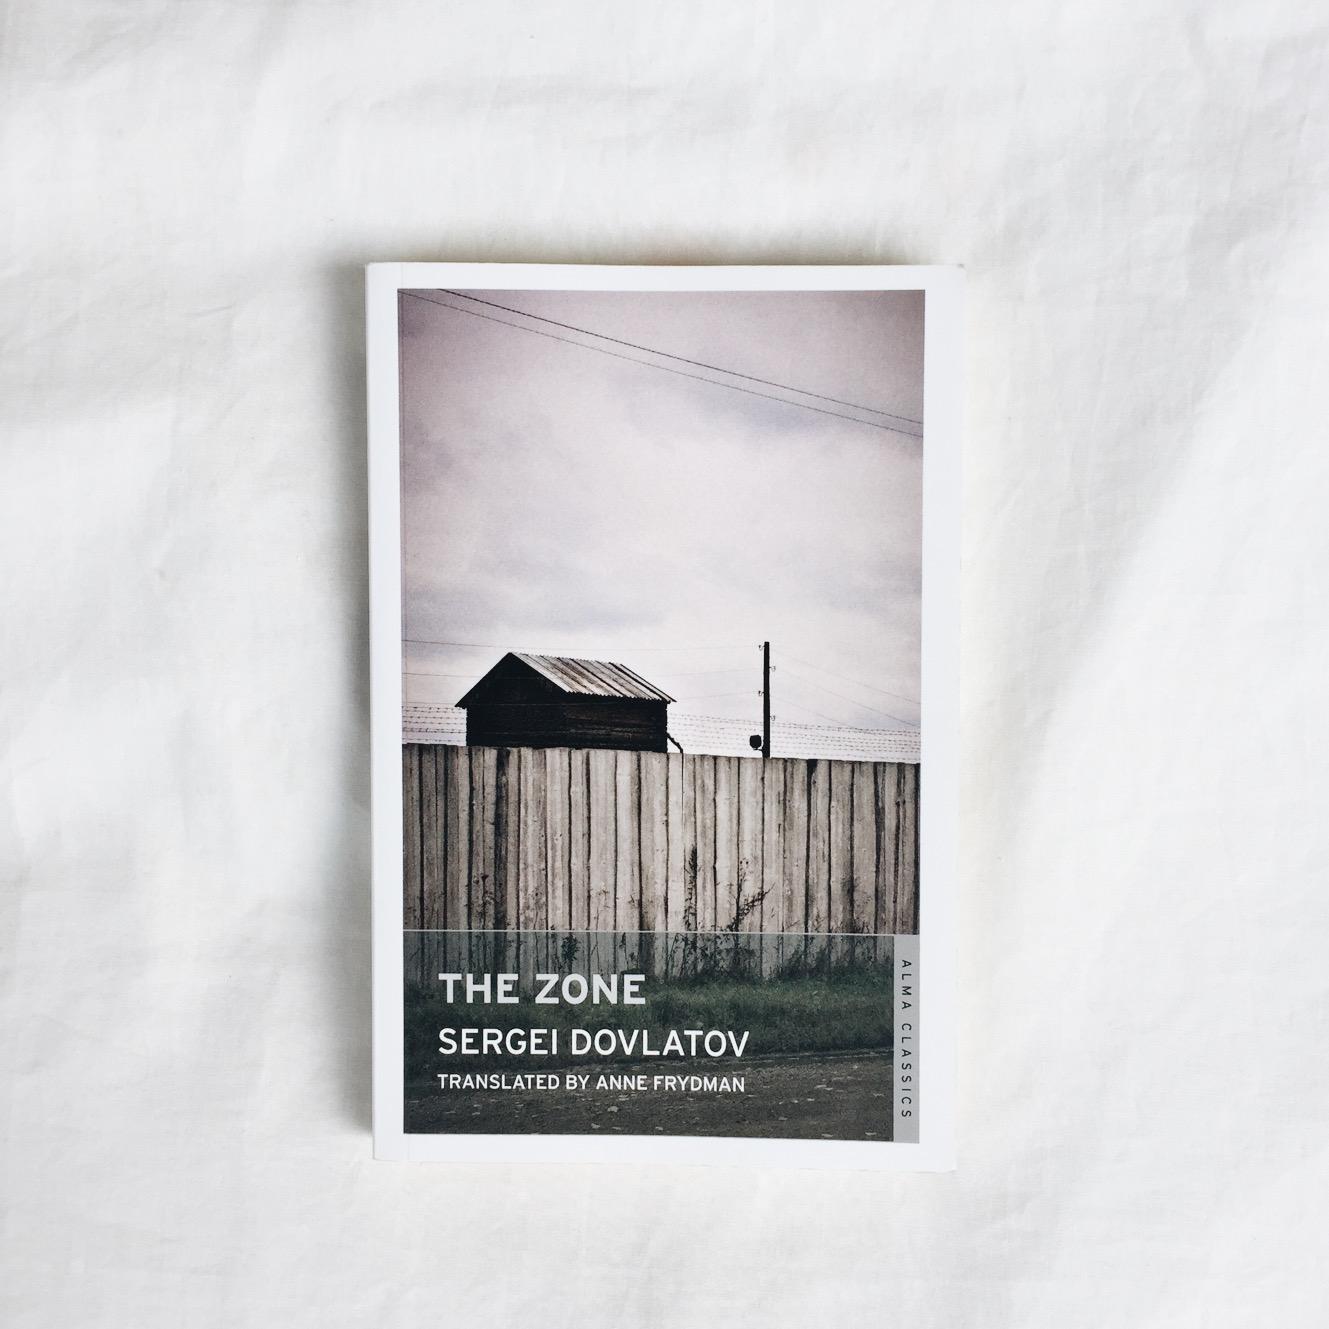 18/ The Zone — Sergei Dovlatov